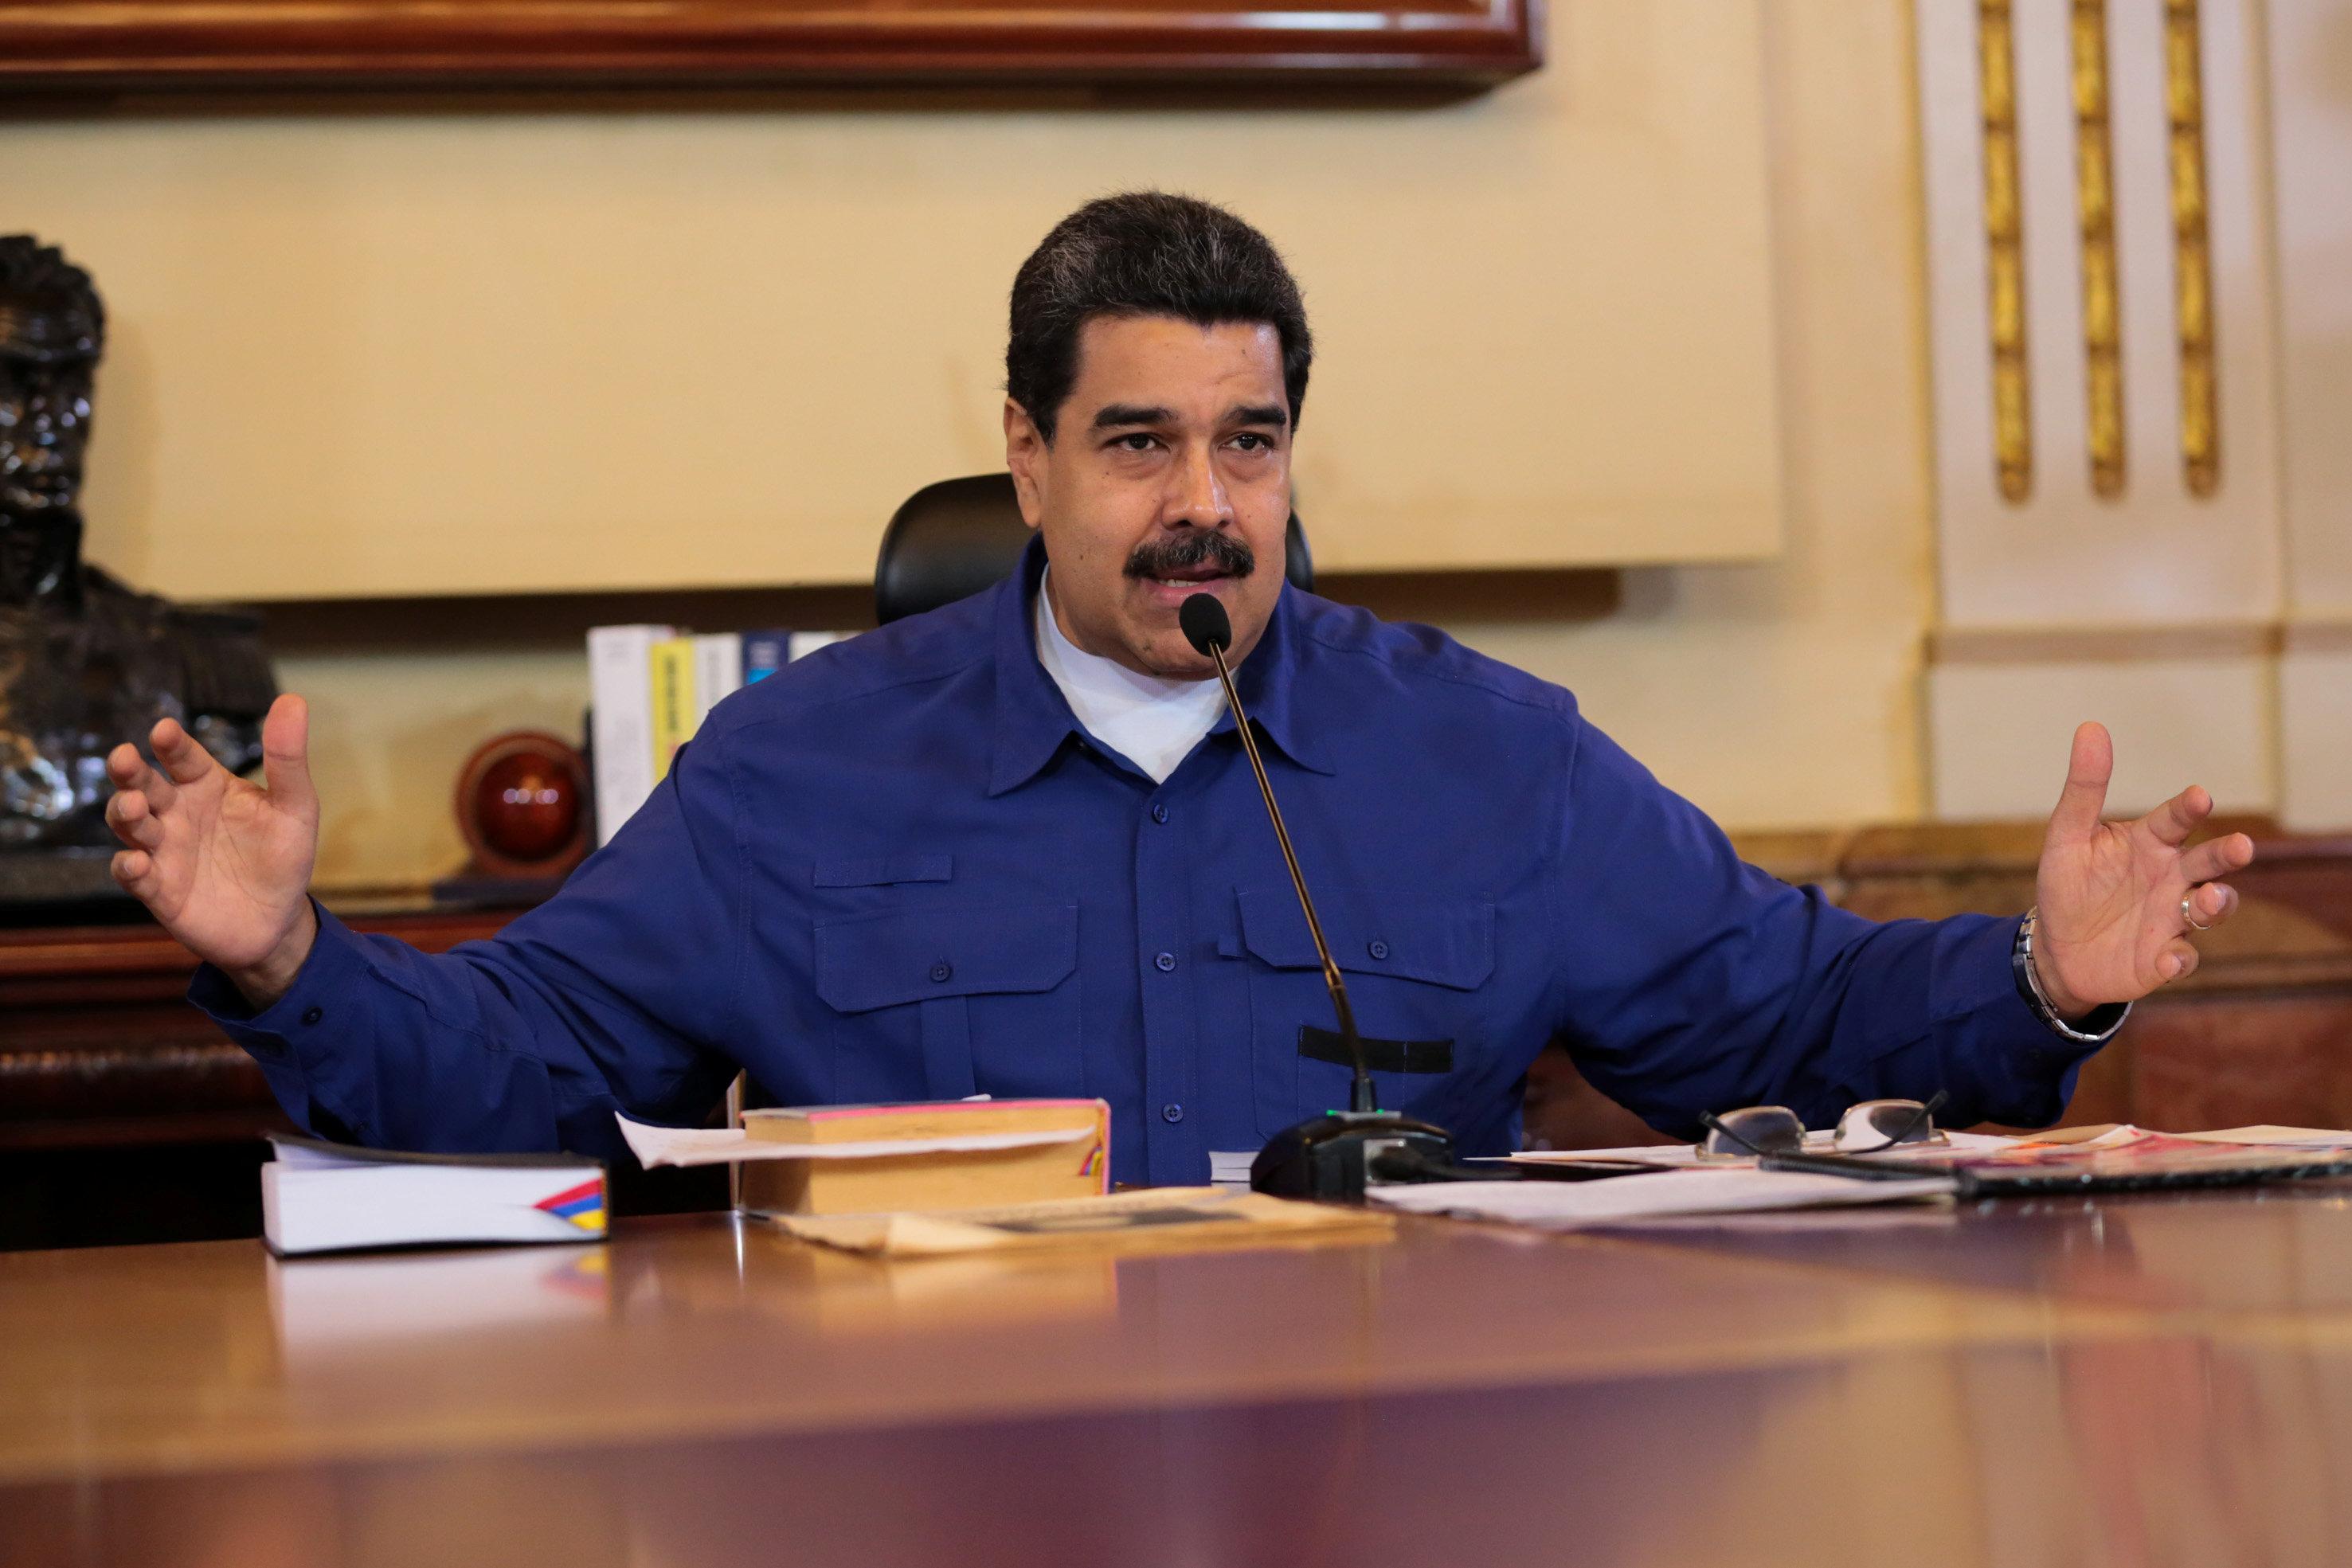 Liberados periodista y camarógrafos retenidos en Caracas